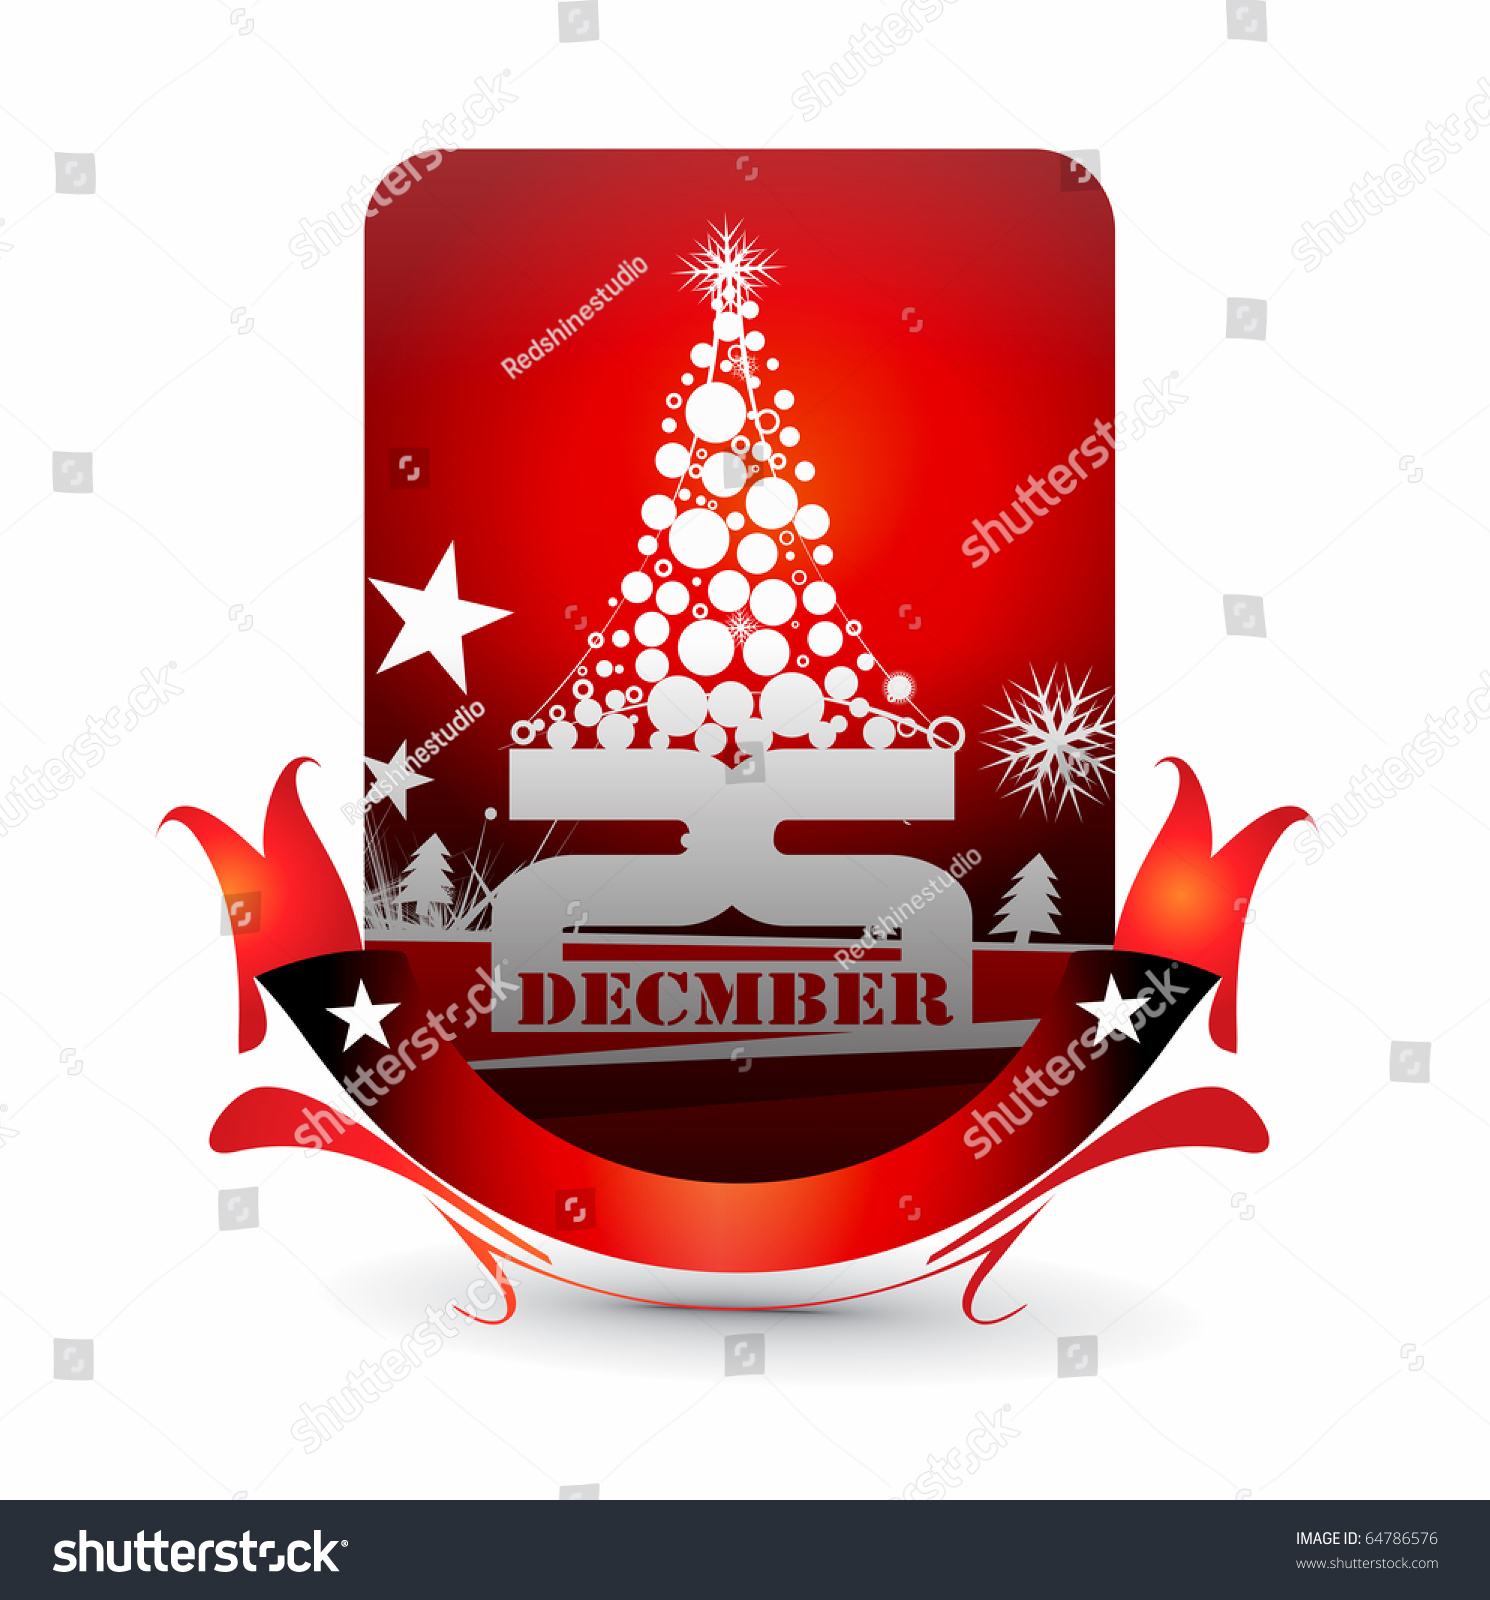 Vector Design Christmas Party Invitation Card Stock Vector 64786576 ...